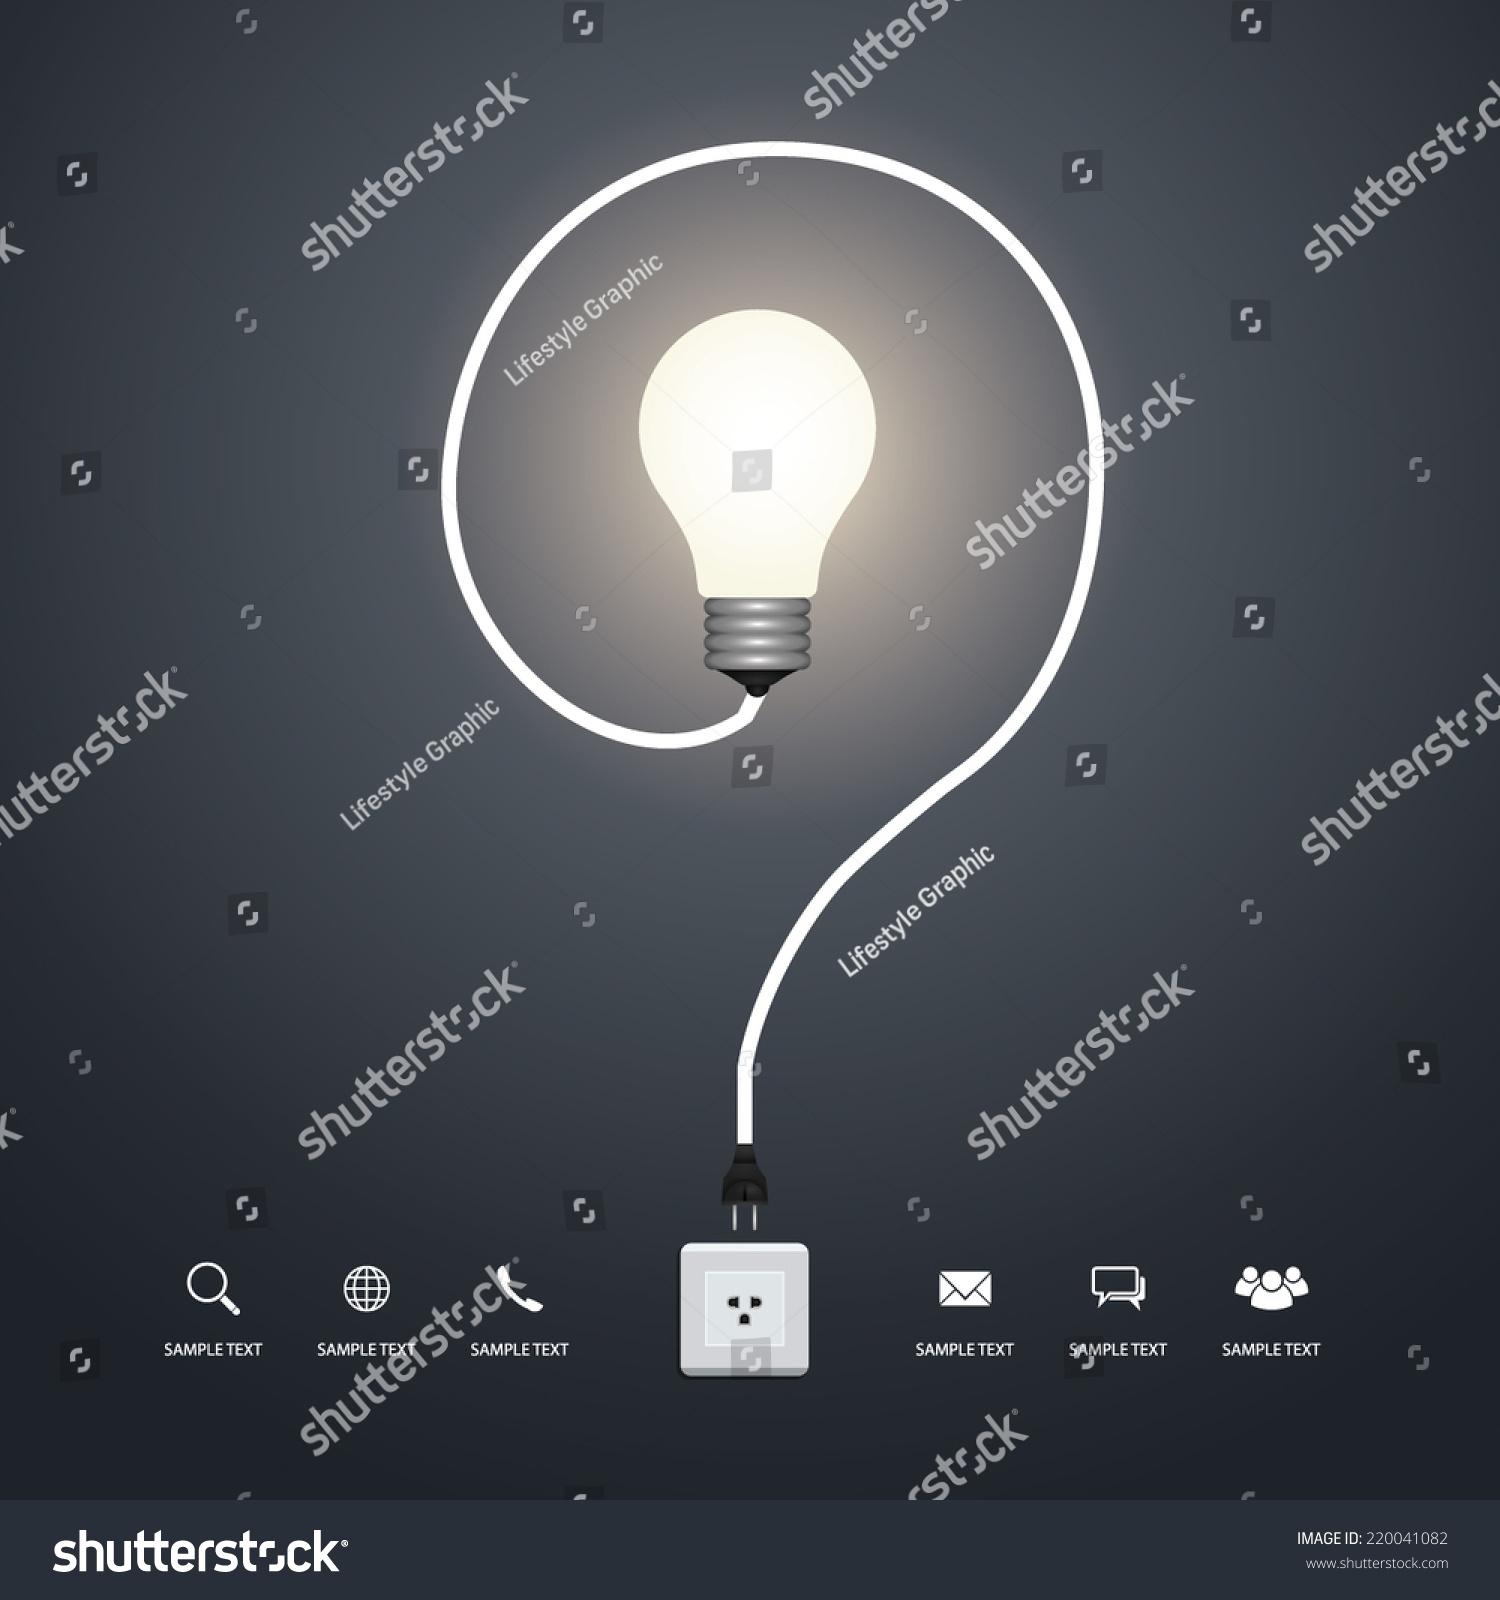 Question Mark Creative Light Bulb Vector Stock Vector HD (Royalty ...